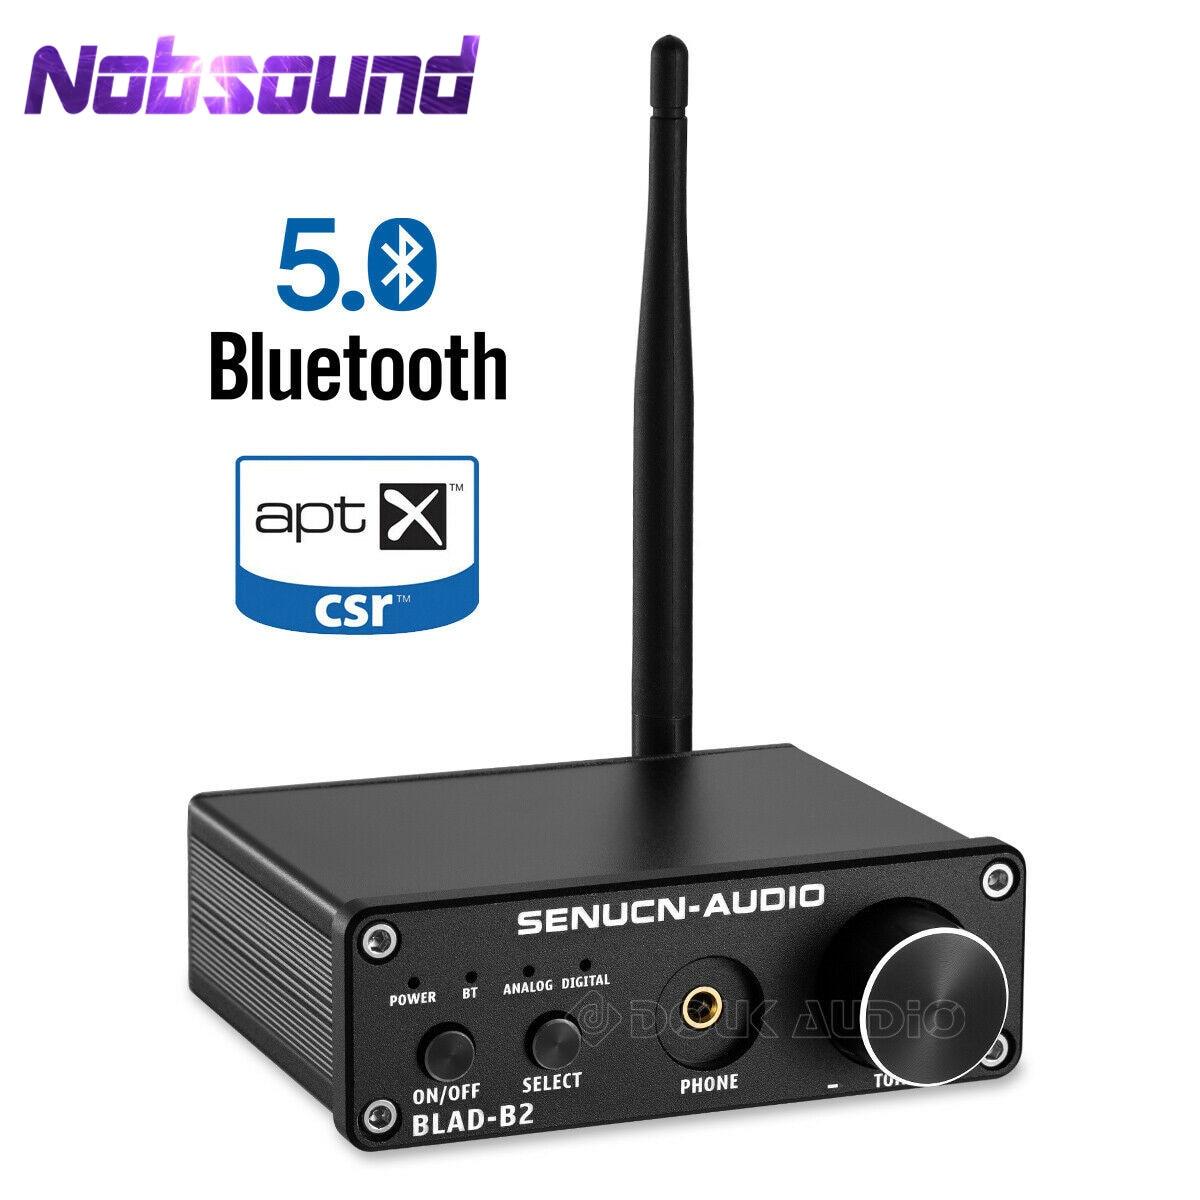 HiFi Bluetooth 5.0 Audio Decoder Mini Stereo Headphone Amplifier DAC Coaxial/Optical Black/SilverHiFi Bluetooth 5.0 Audio Decoder Mini Stereo Headphone Amplifier DAC Coaxial/Optical Black/Silver